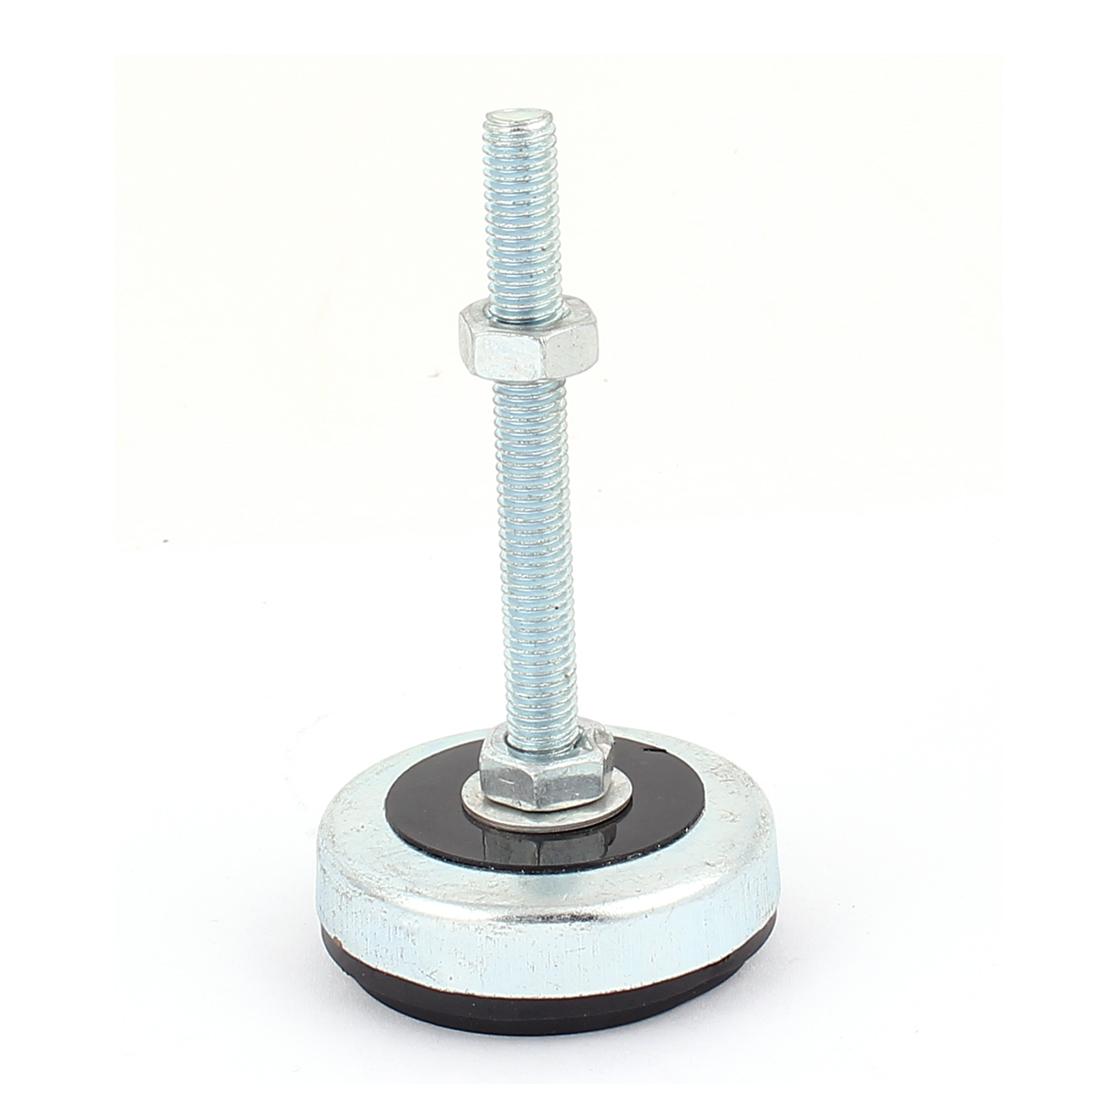 8mm x 75mm Thread 50mm Base Dia Screw On Design Furniture Glide Leveling Foot Adjuster